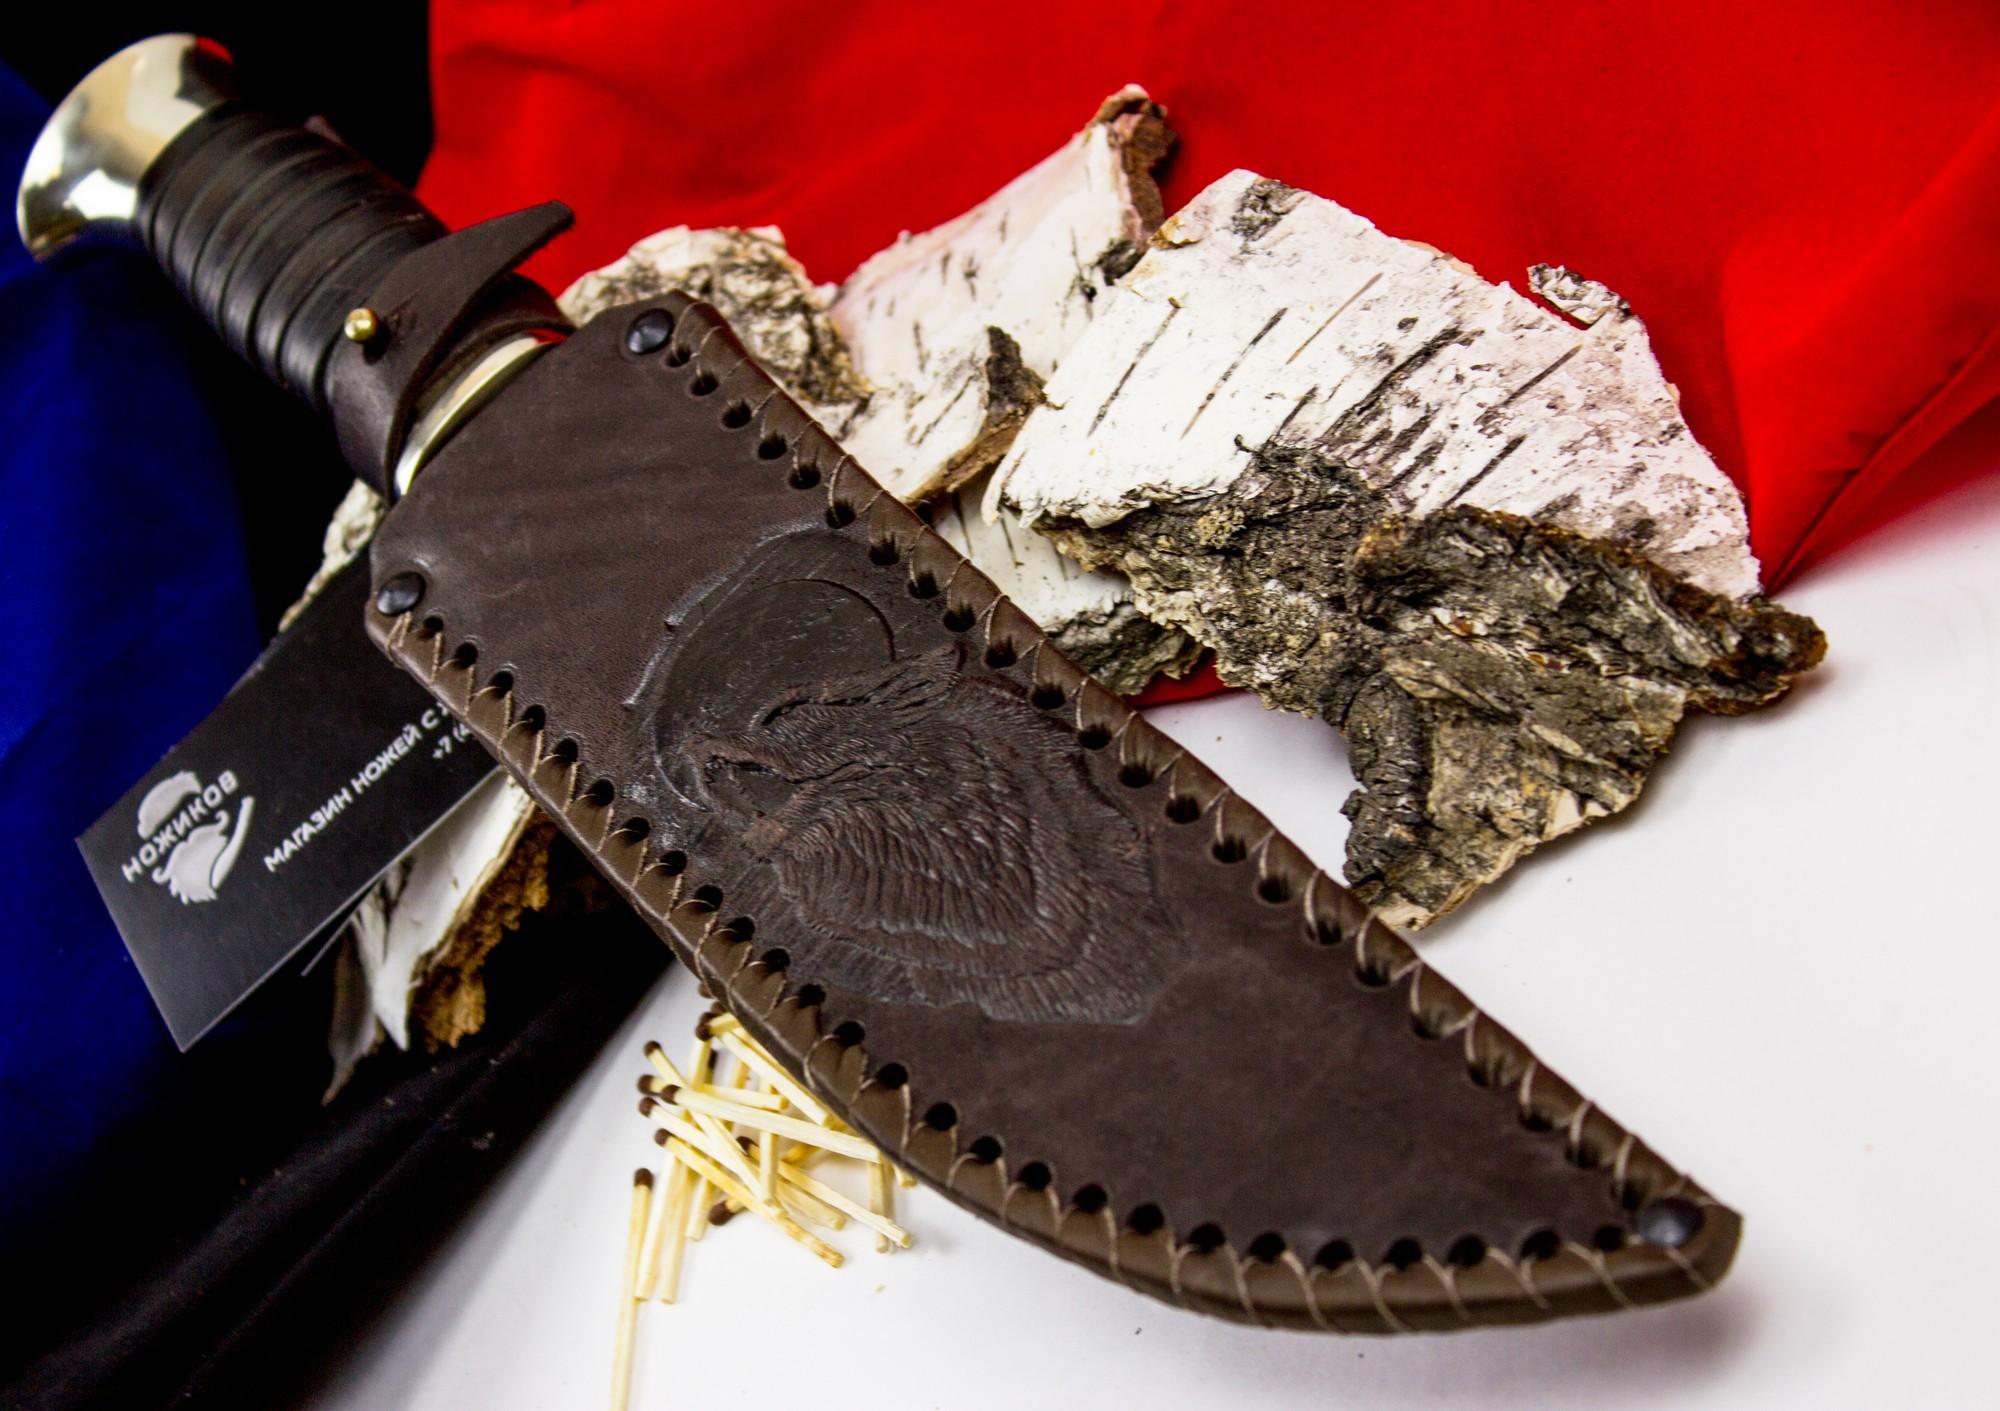 Фото 8 - Пластунский кованый нож Казак, Х12МФ, мельхиор от Кузница Семина